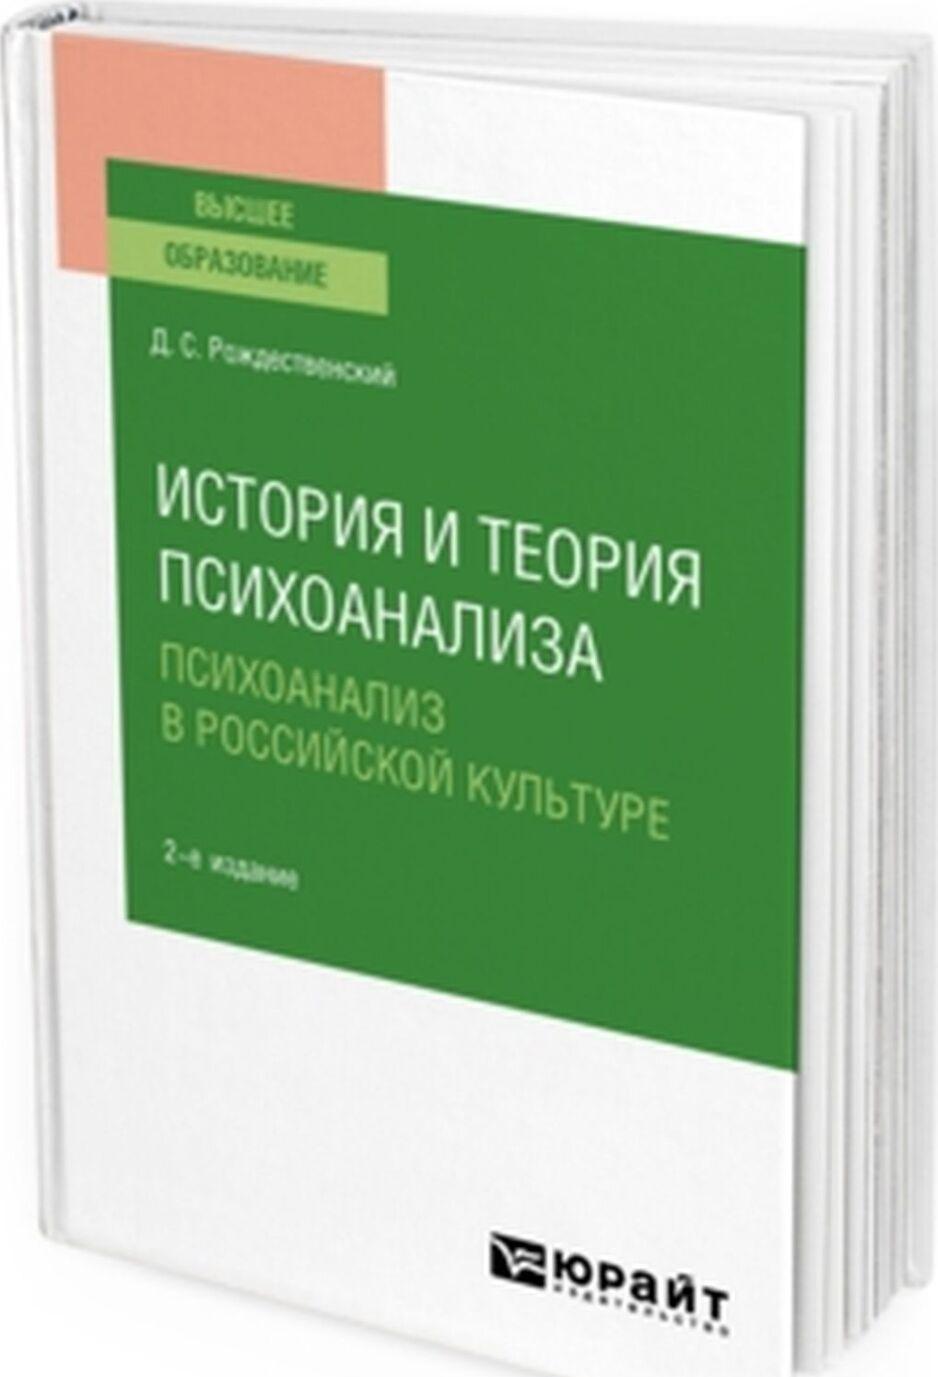 Istorija i teorija psikhoanaliza. psikhoanaliz v rossijskoj kulture. Uchebnoe posobie dlja vuzov